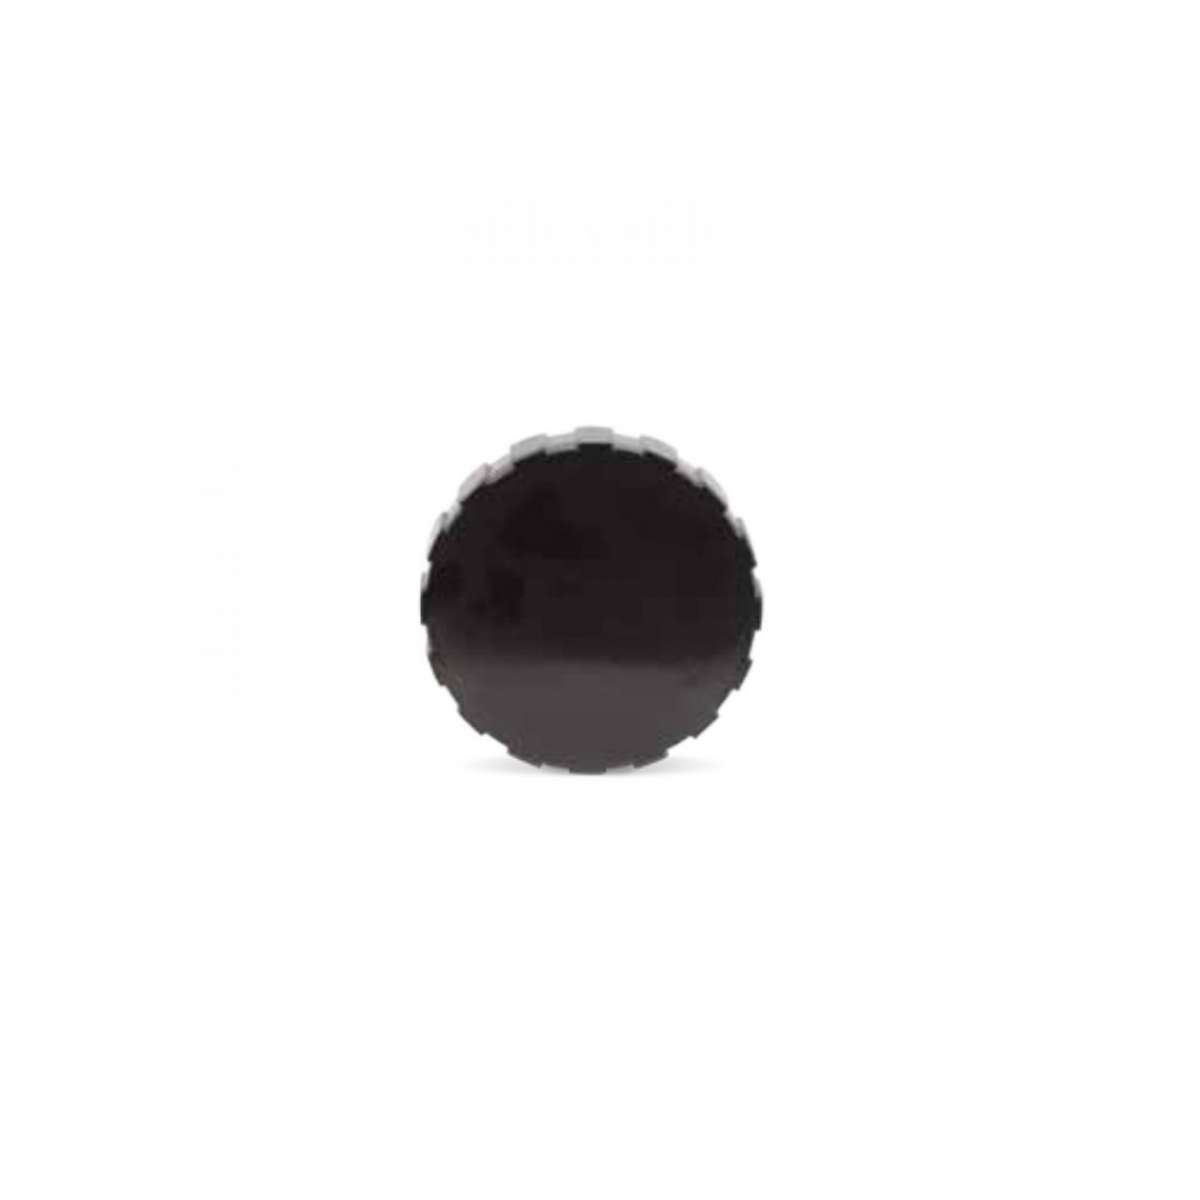 IsoLink Pump Lid Cap - Black